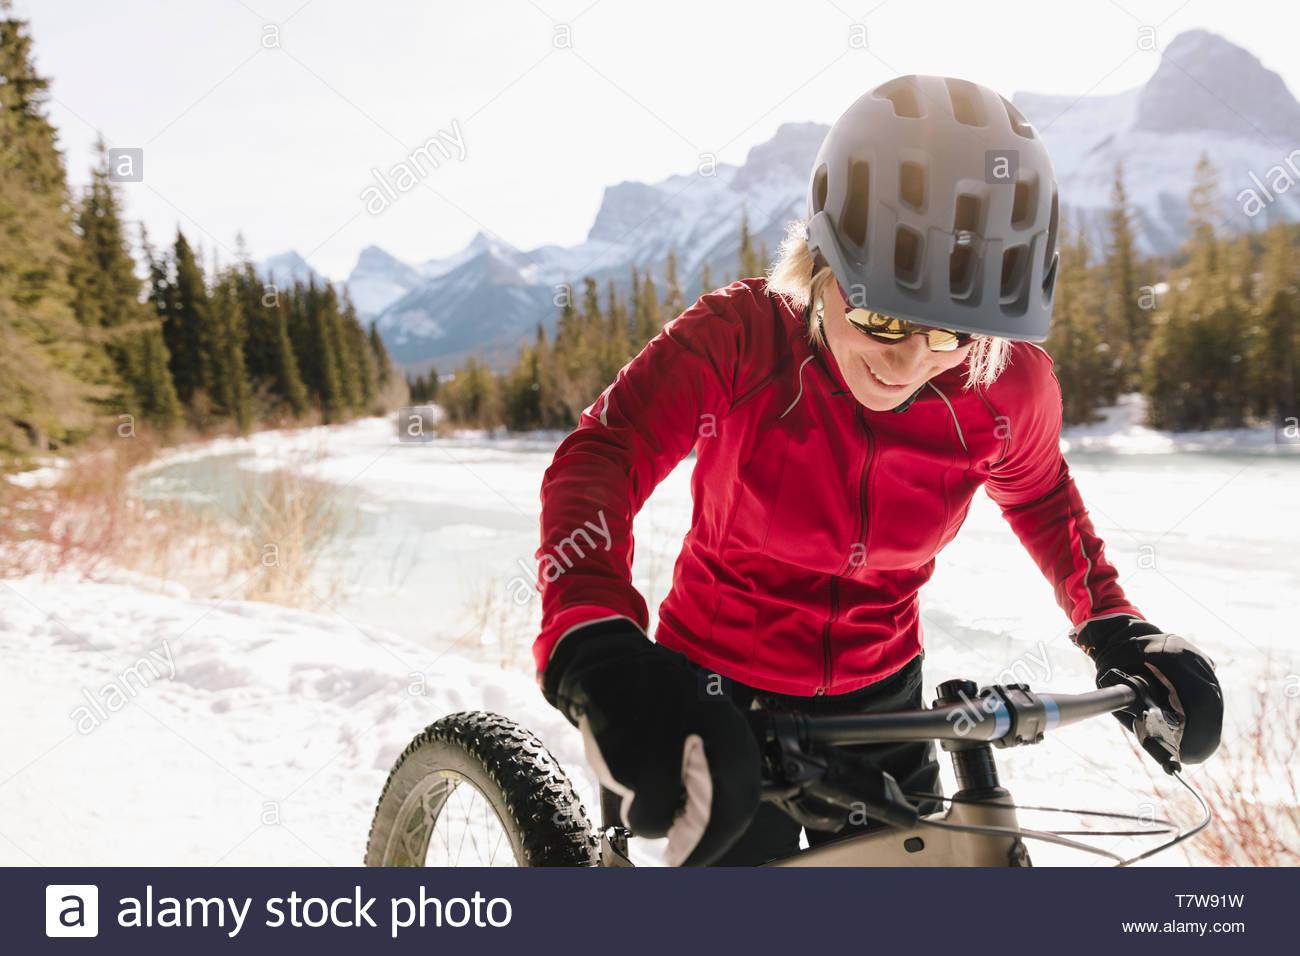 Smiling woman fat biking on snowy mountain trail - Stock Image